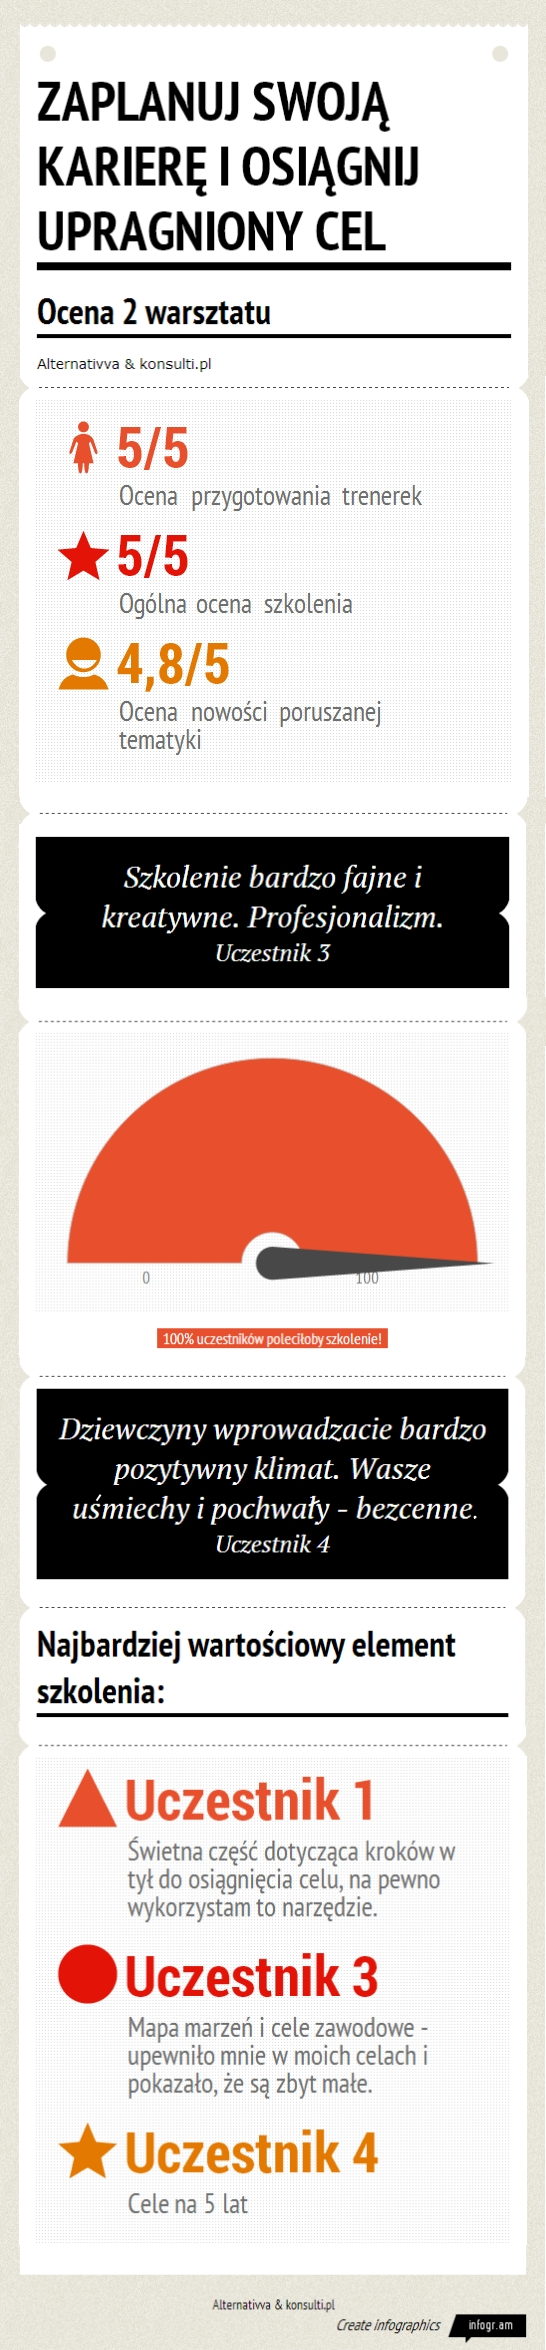 Infografika - ocena warsztatu